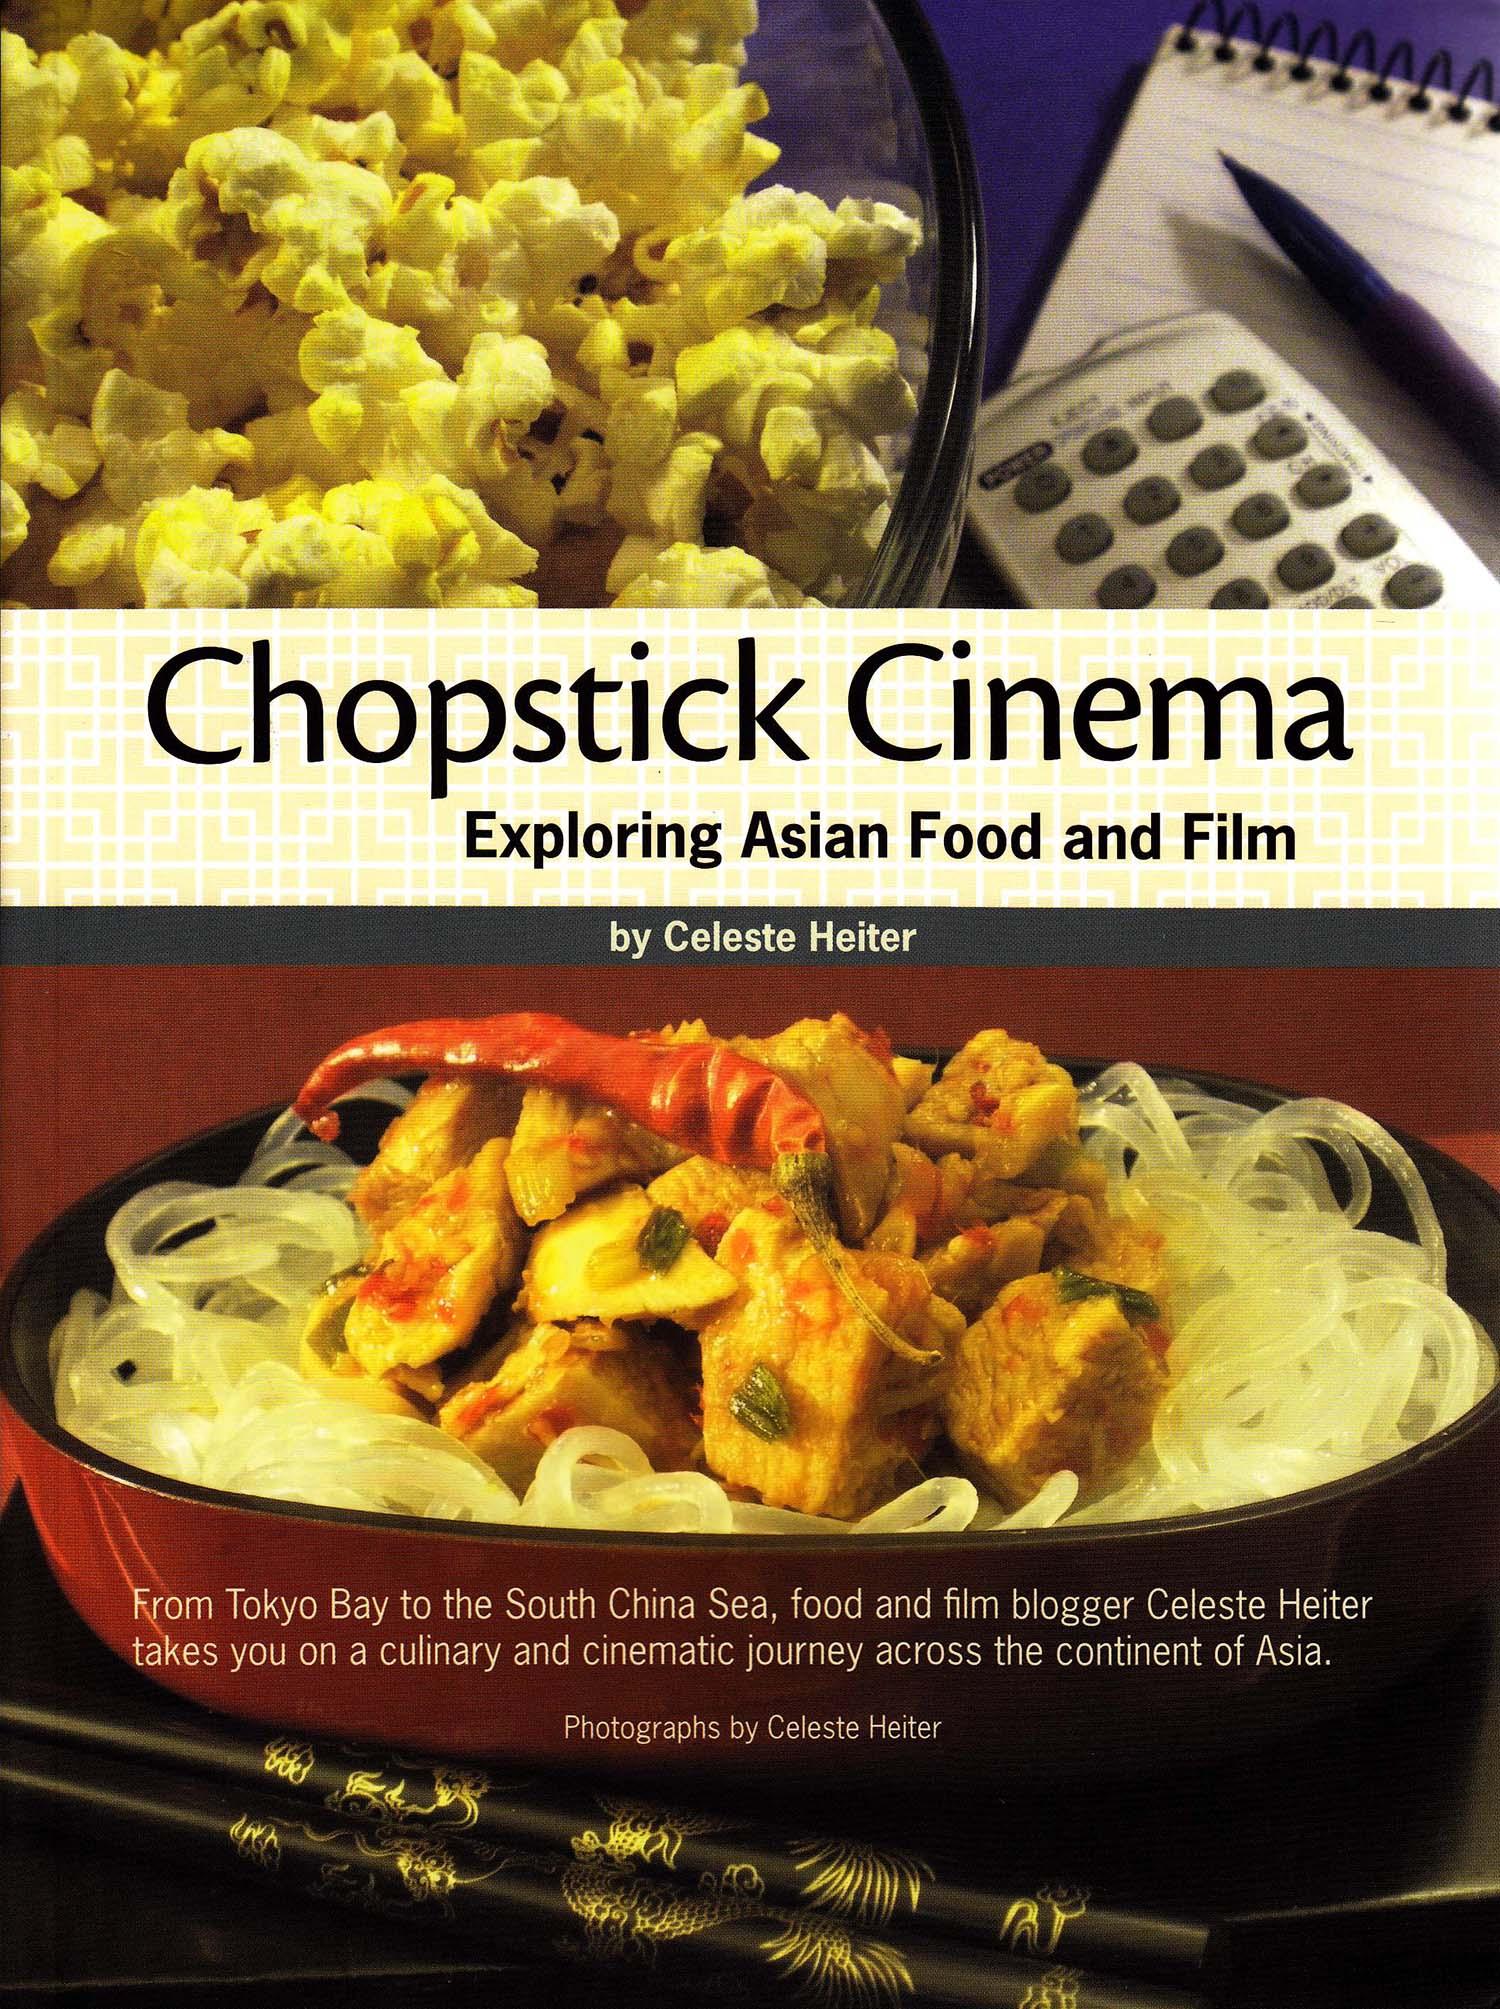 ChopstickCinema.jpg